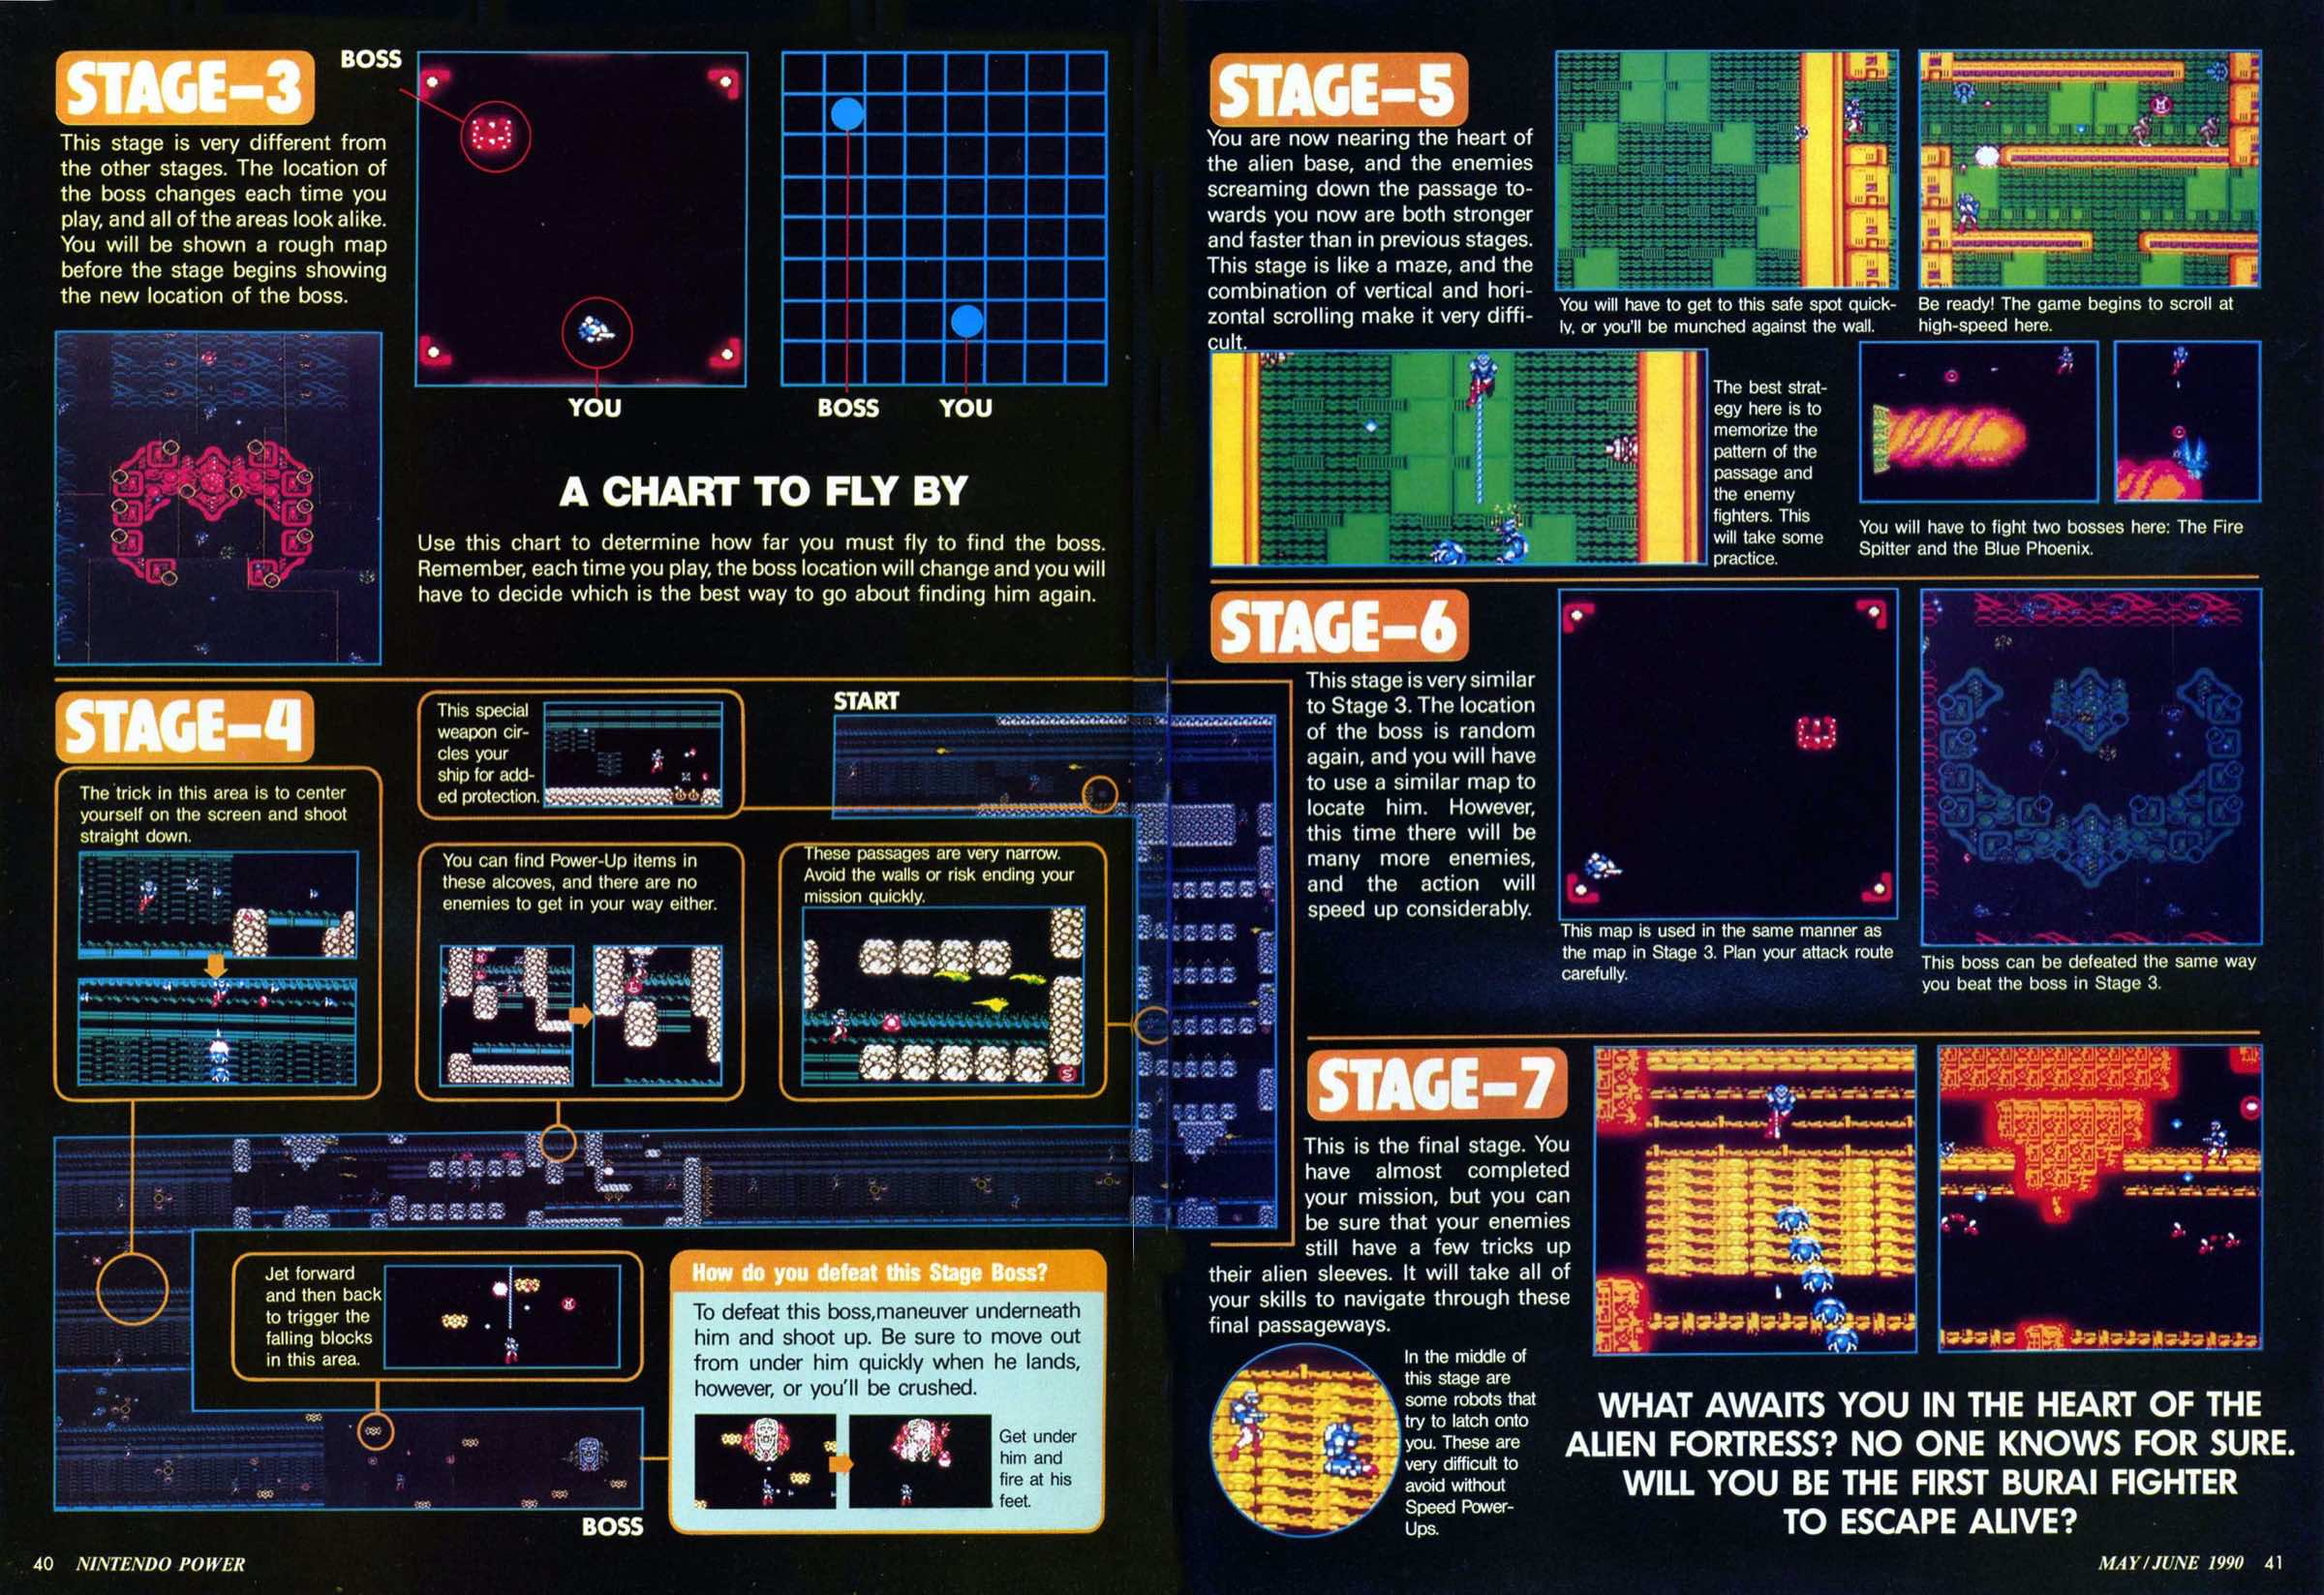 Nintendo Power | May June 1990 | p040-041